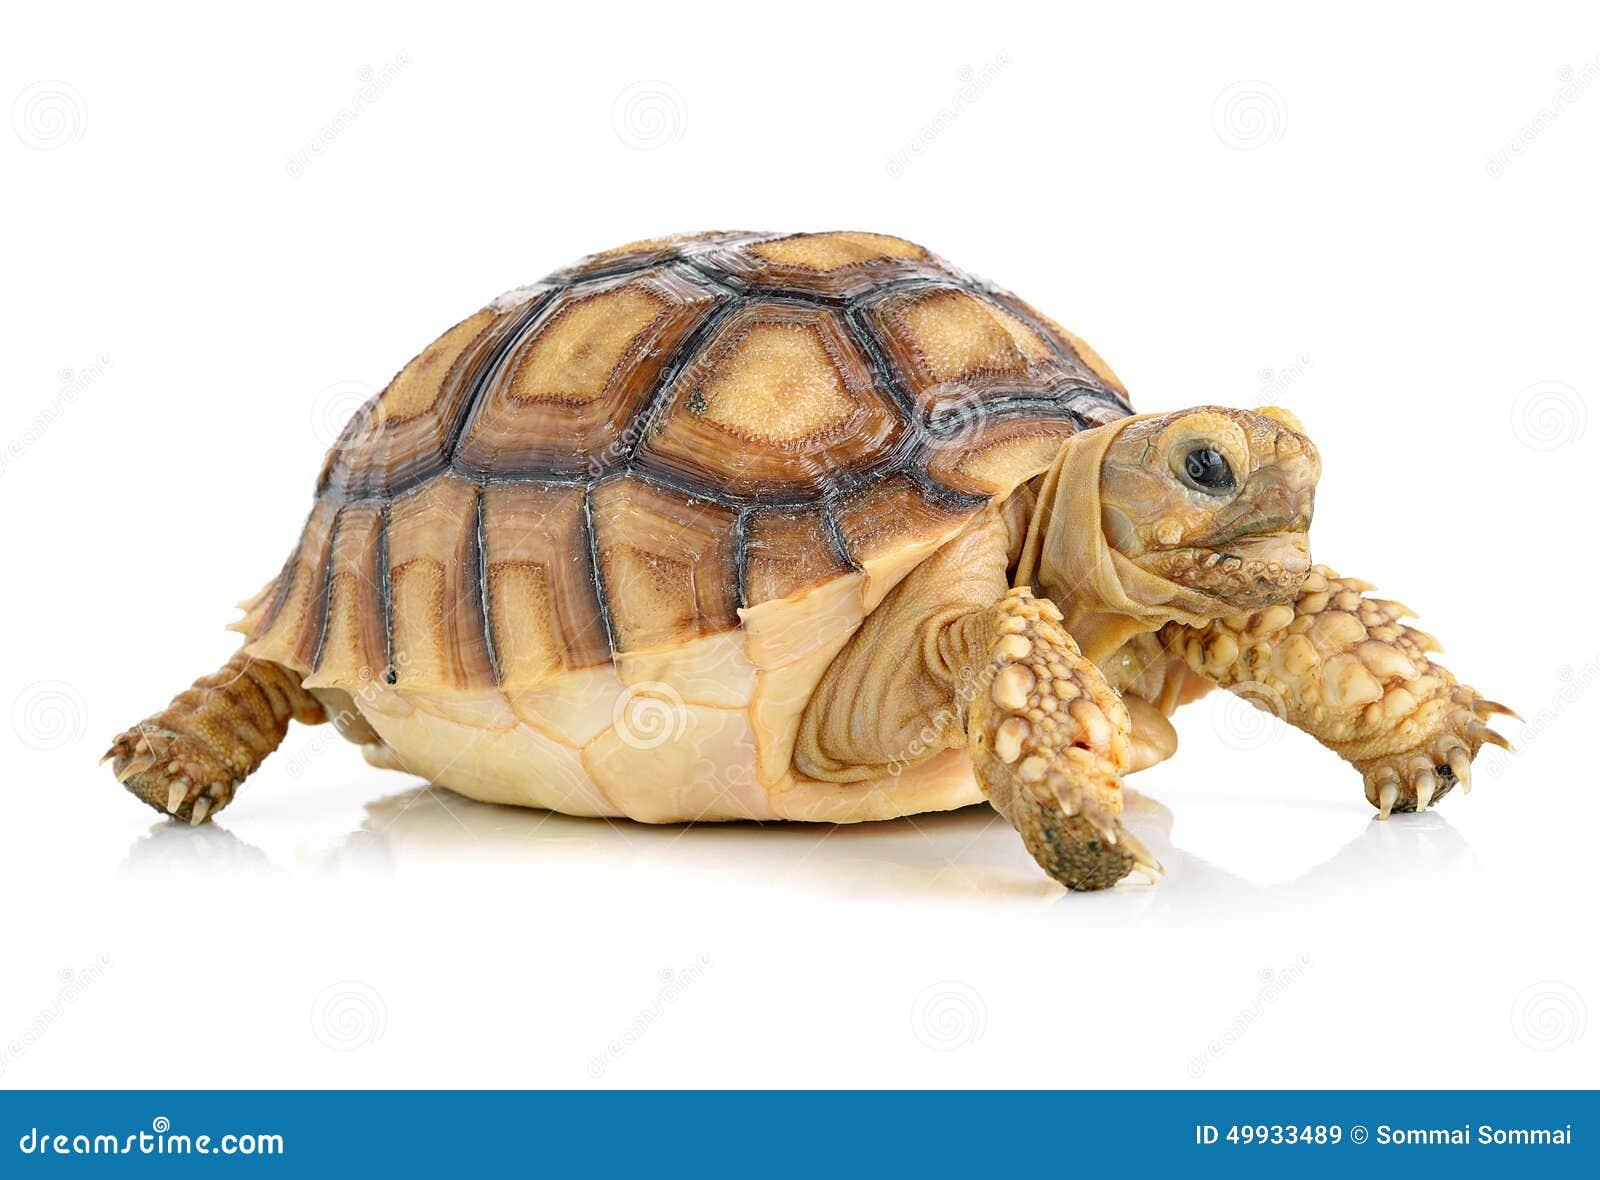 turtle white background - photo #19